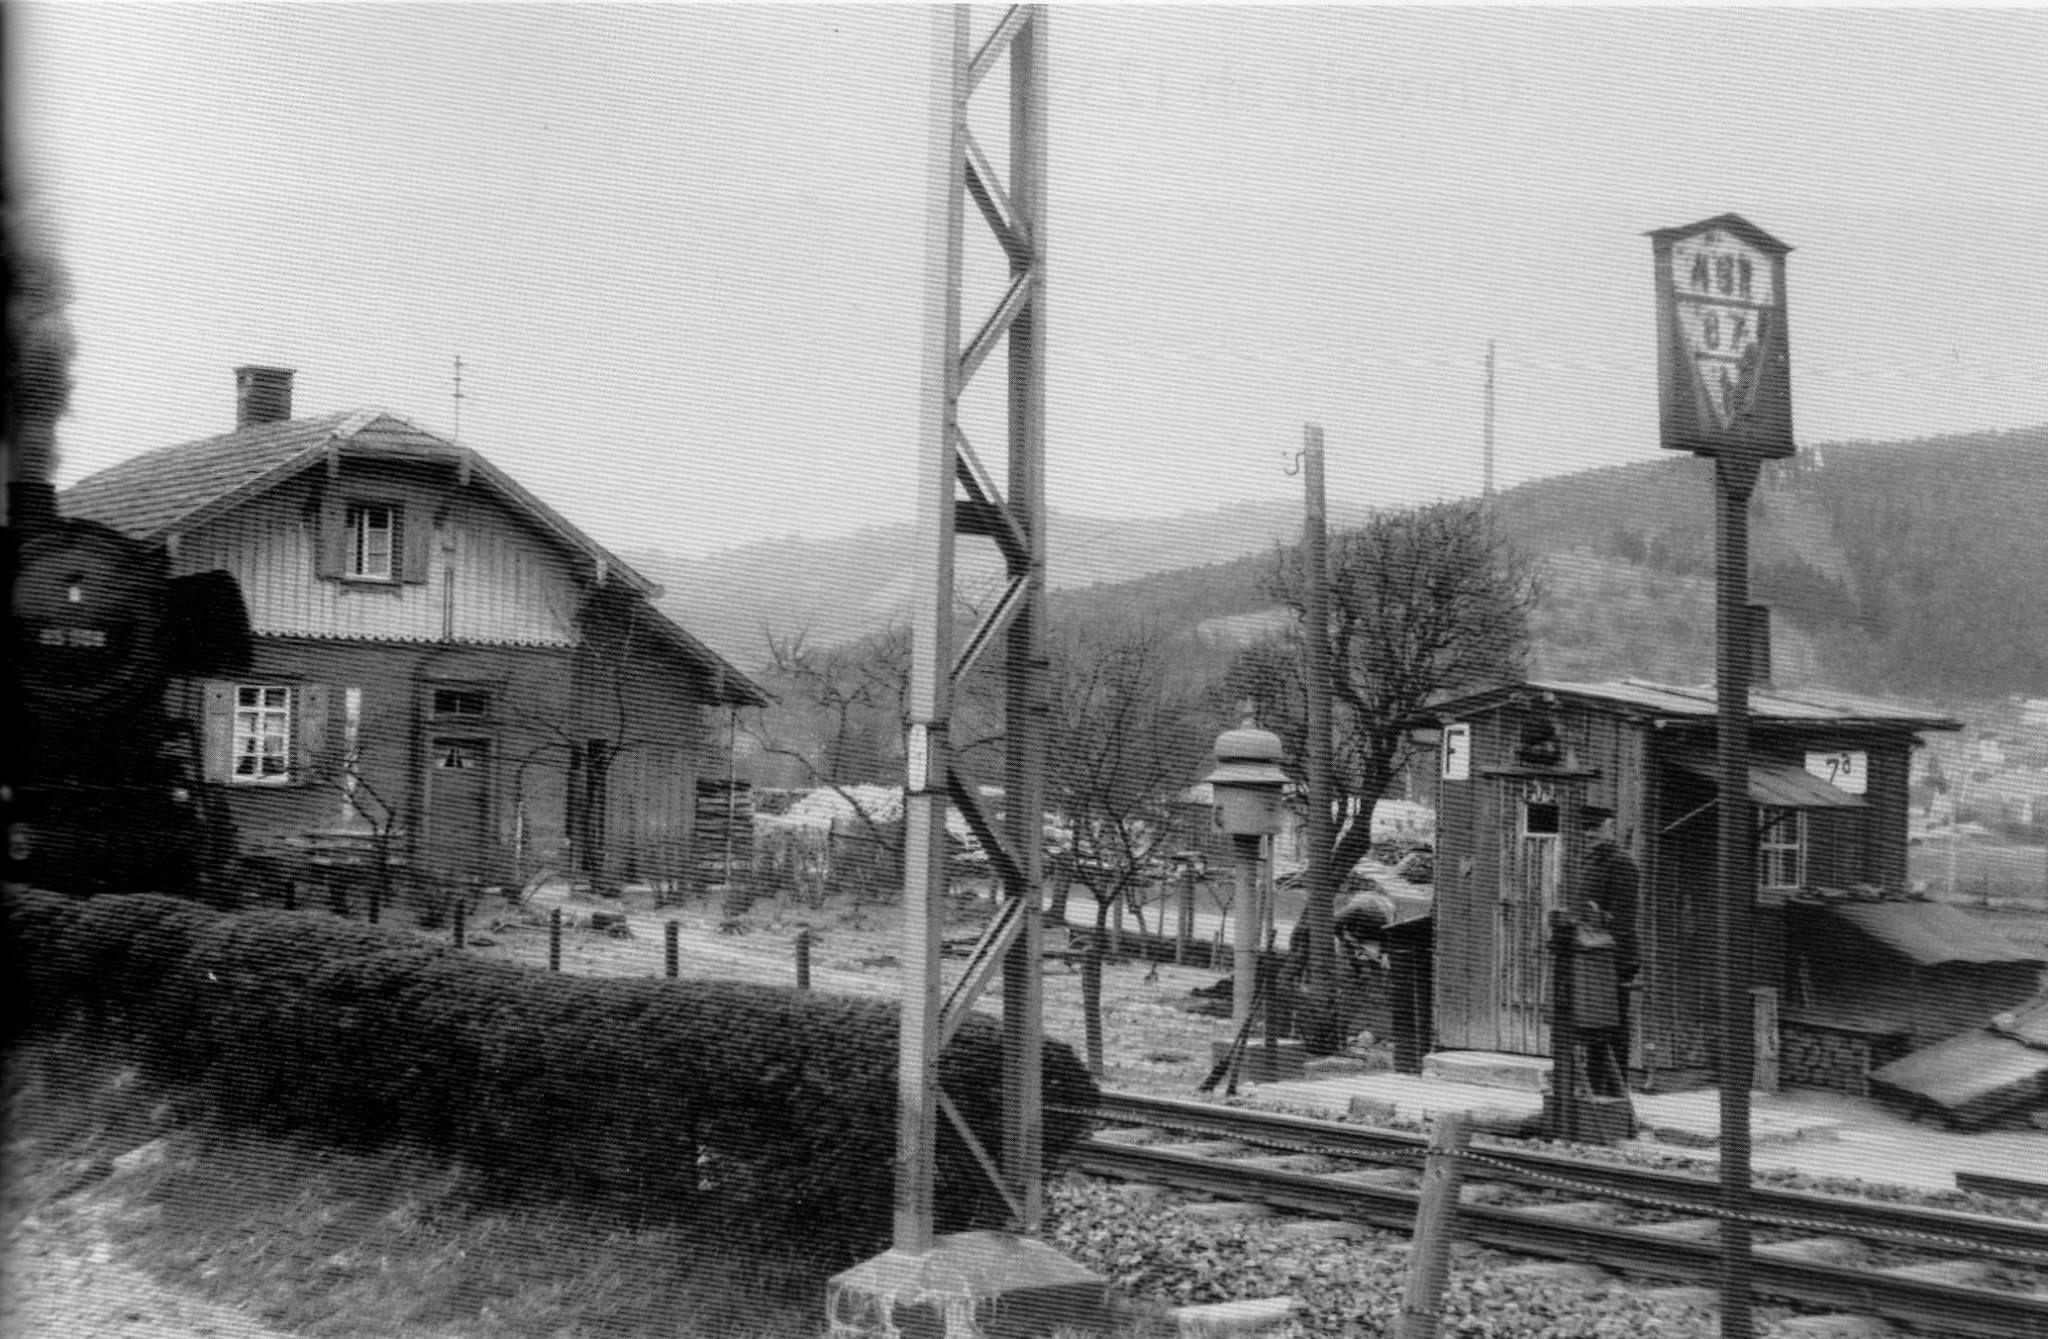 Freiburg Littenweiler: Dampflokomotive am Bahnübergang Kappler Straße. https://www.facebook.com/HistorischesFreiburg/photos/np.1453532307277011.100002251567273/890546437702673/?type=3